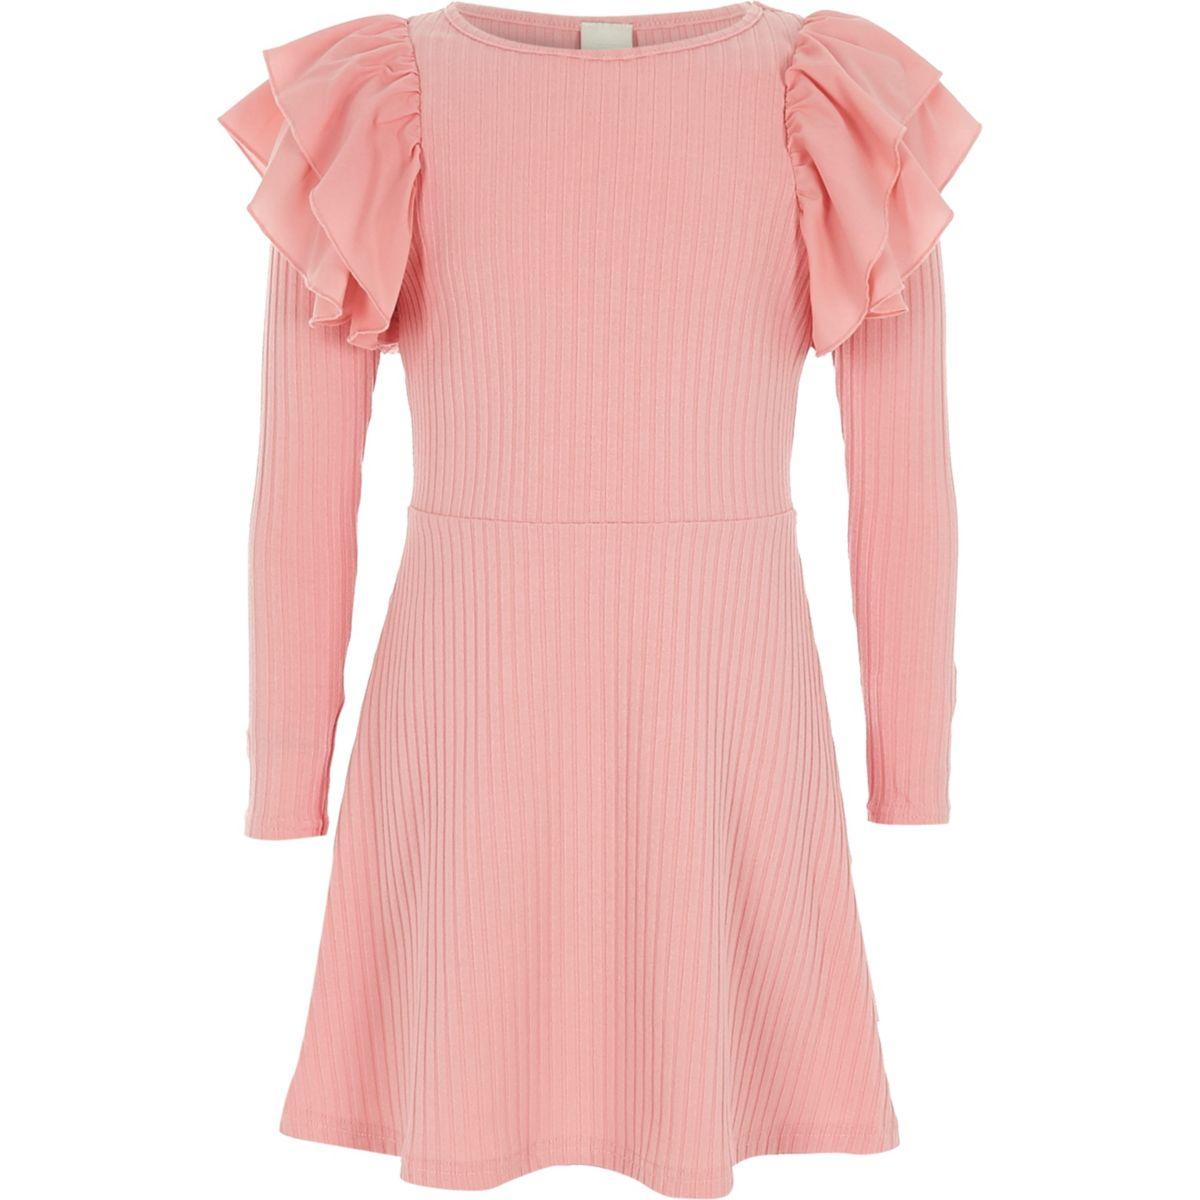 Girls pink frill ribbed midi dress